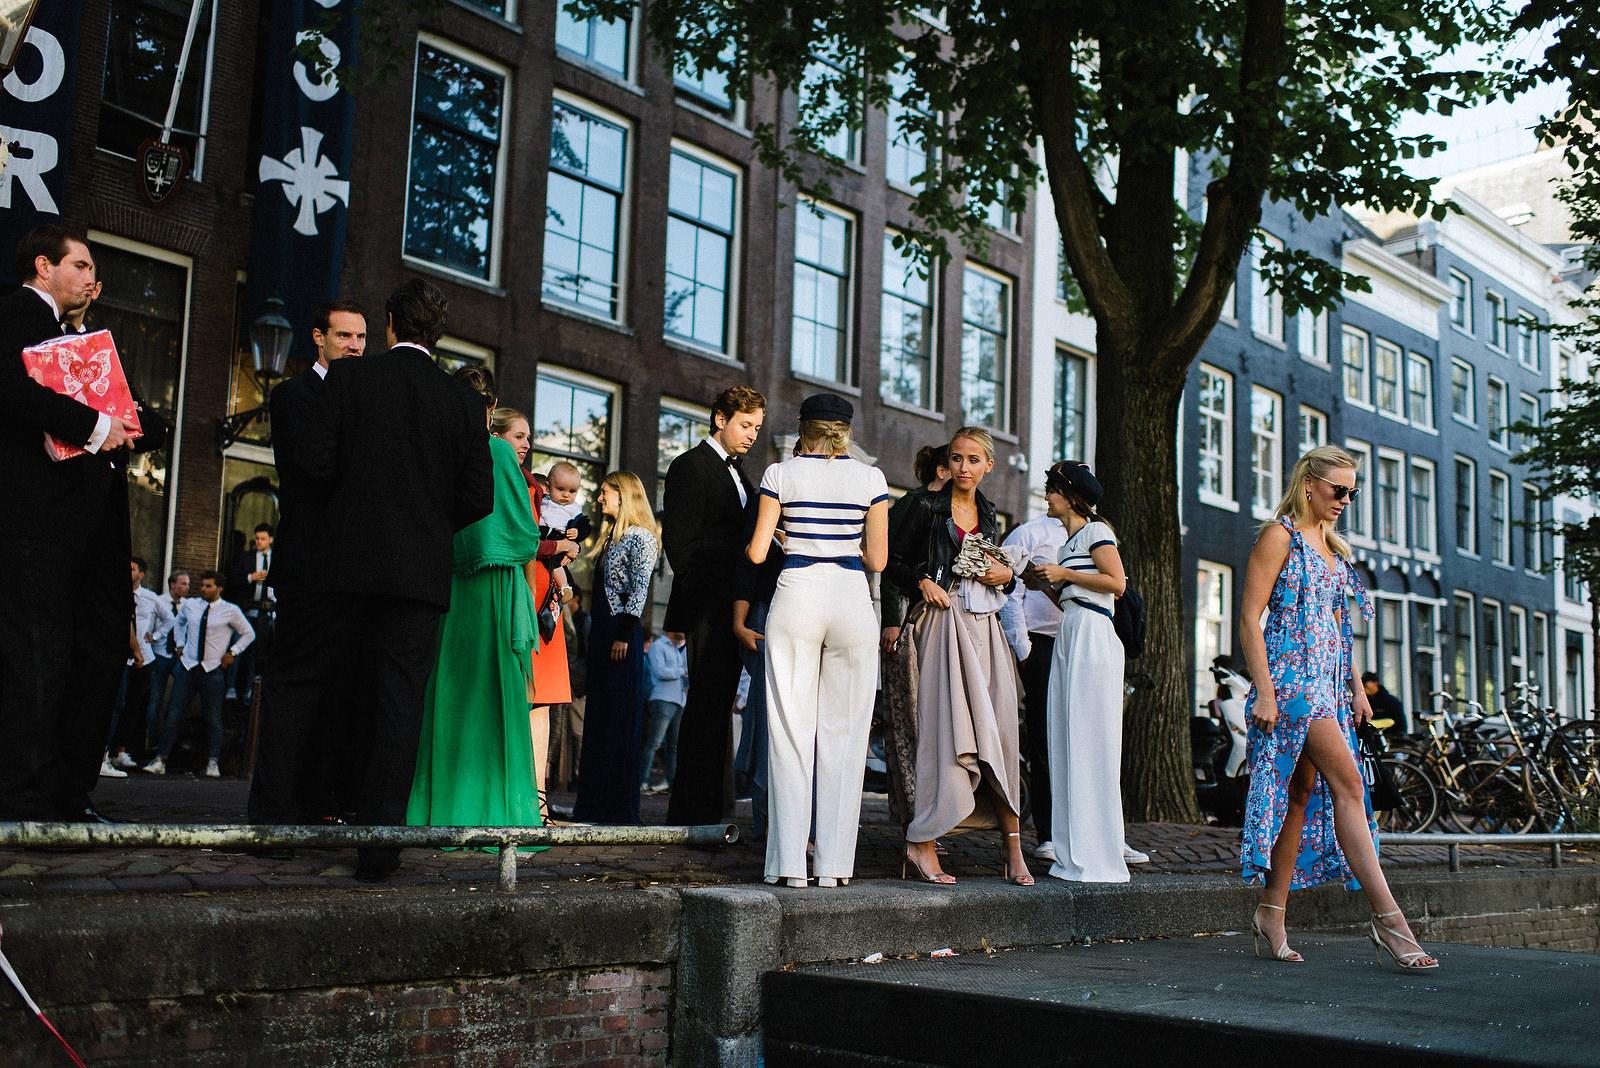 Fotograf Konstanz - Destination Wedding Photographer Amsterdam 091 - Destination Wedding Amsterdam  - 196 -